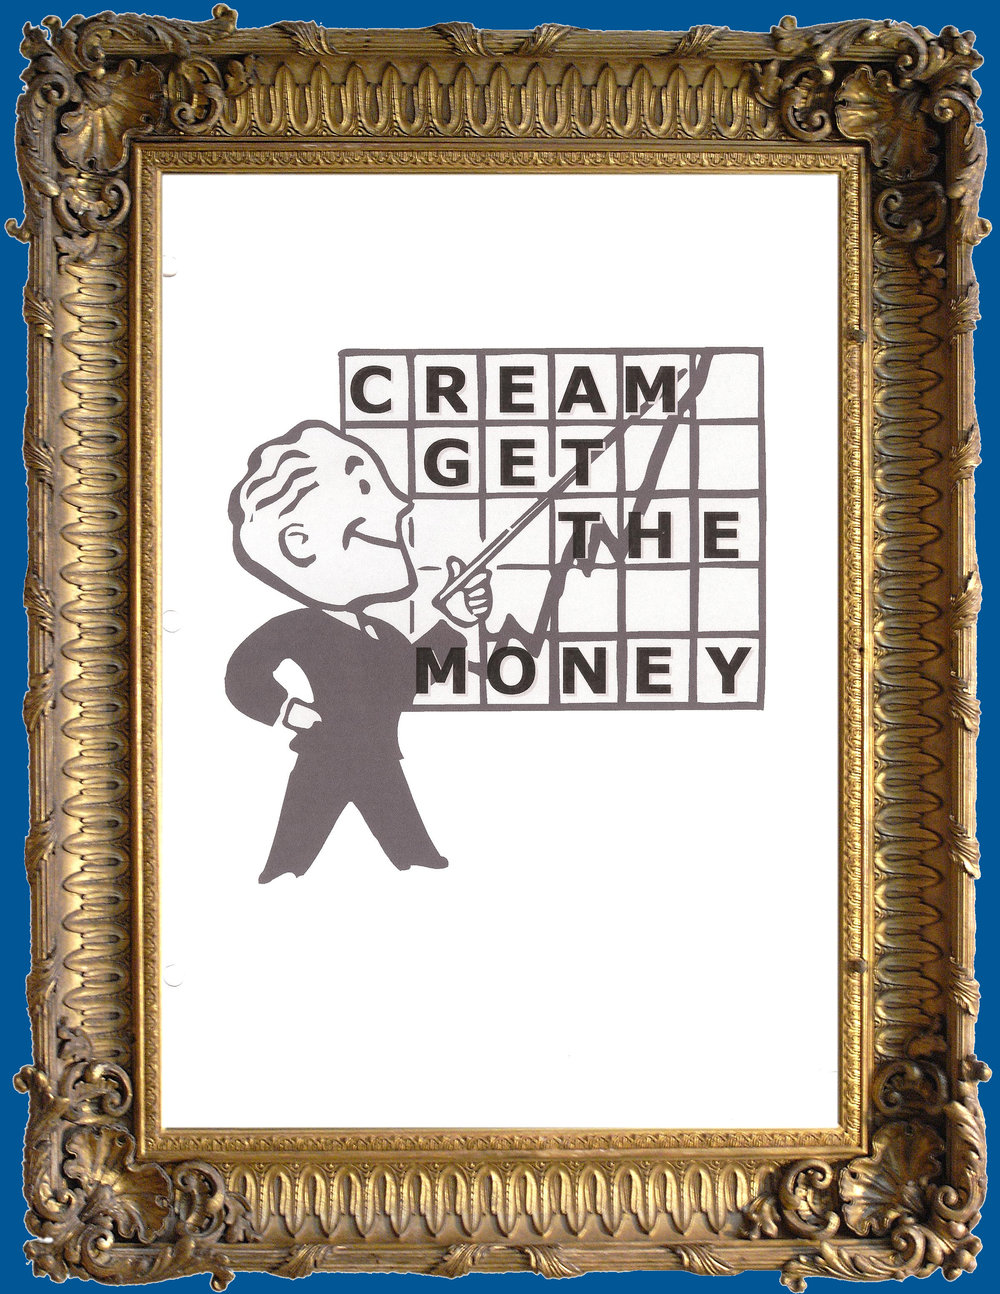 HSG - Cream.jpg